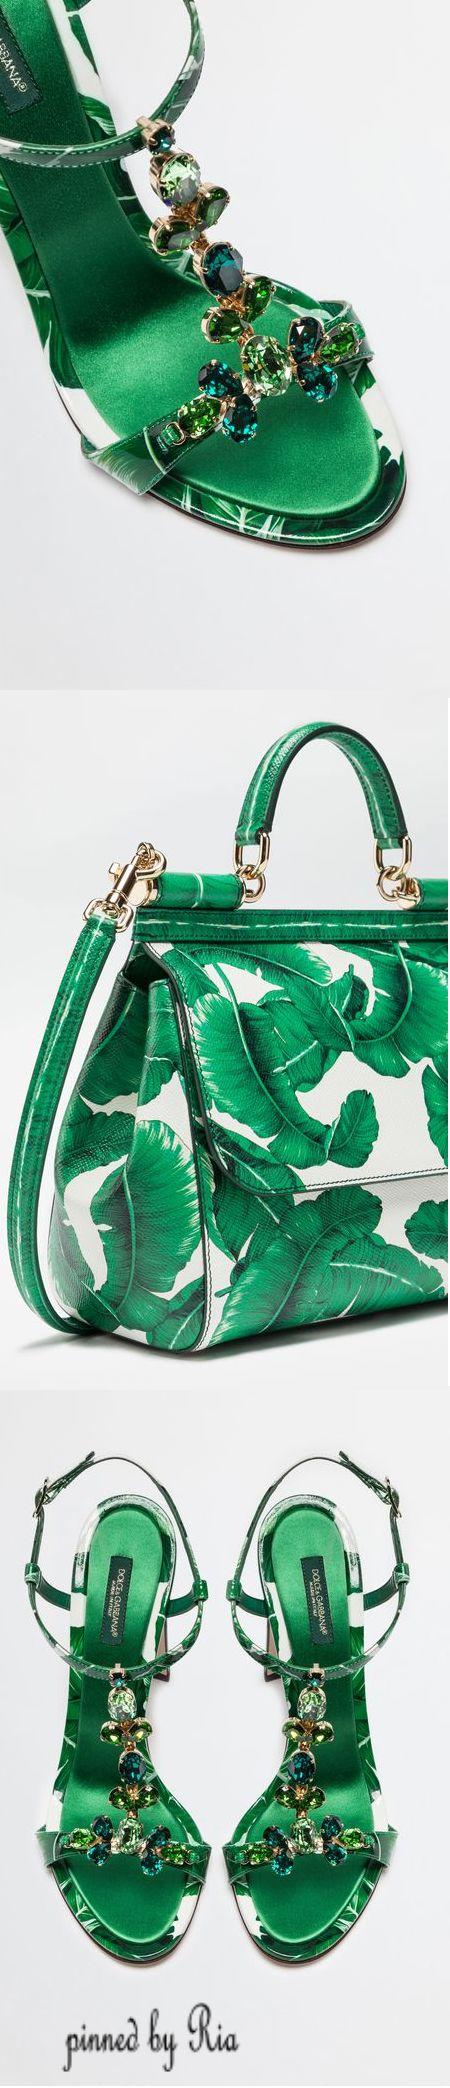 Dolce & Gabbana Sicily Banana Leaf Jeweled Sandals & Matching Handbag l Fall 2017 l Ria